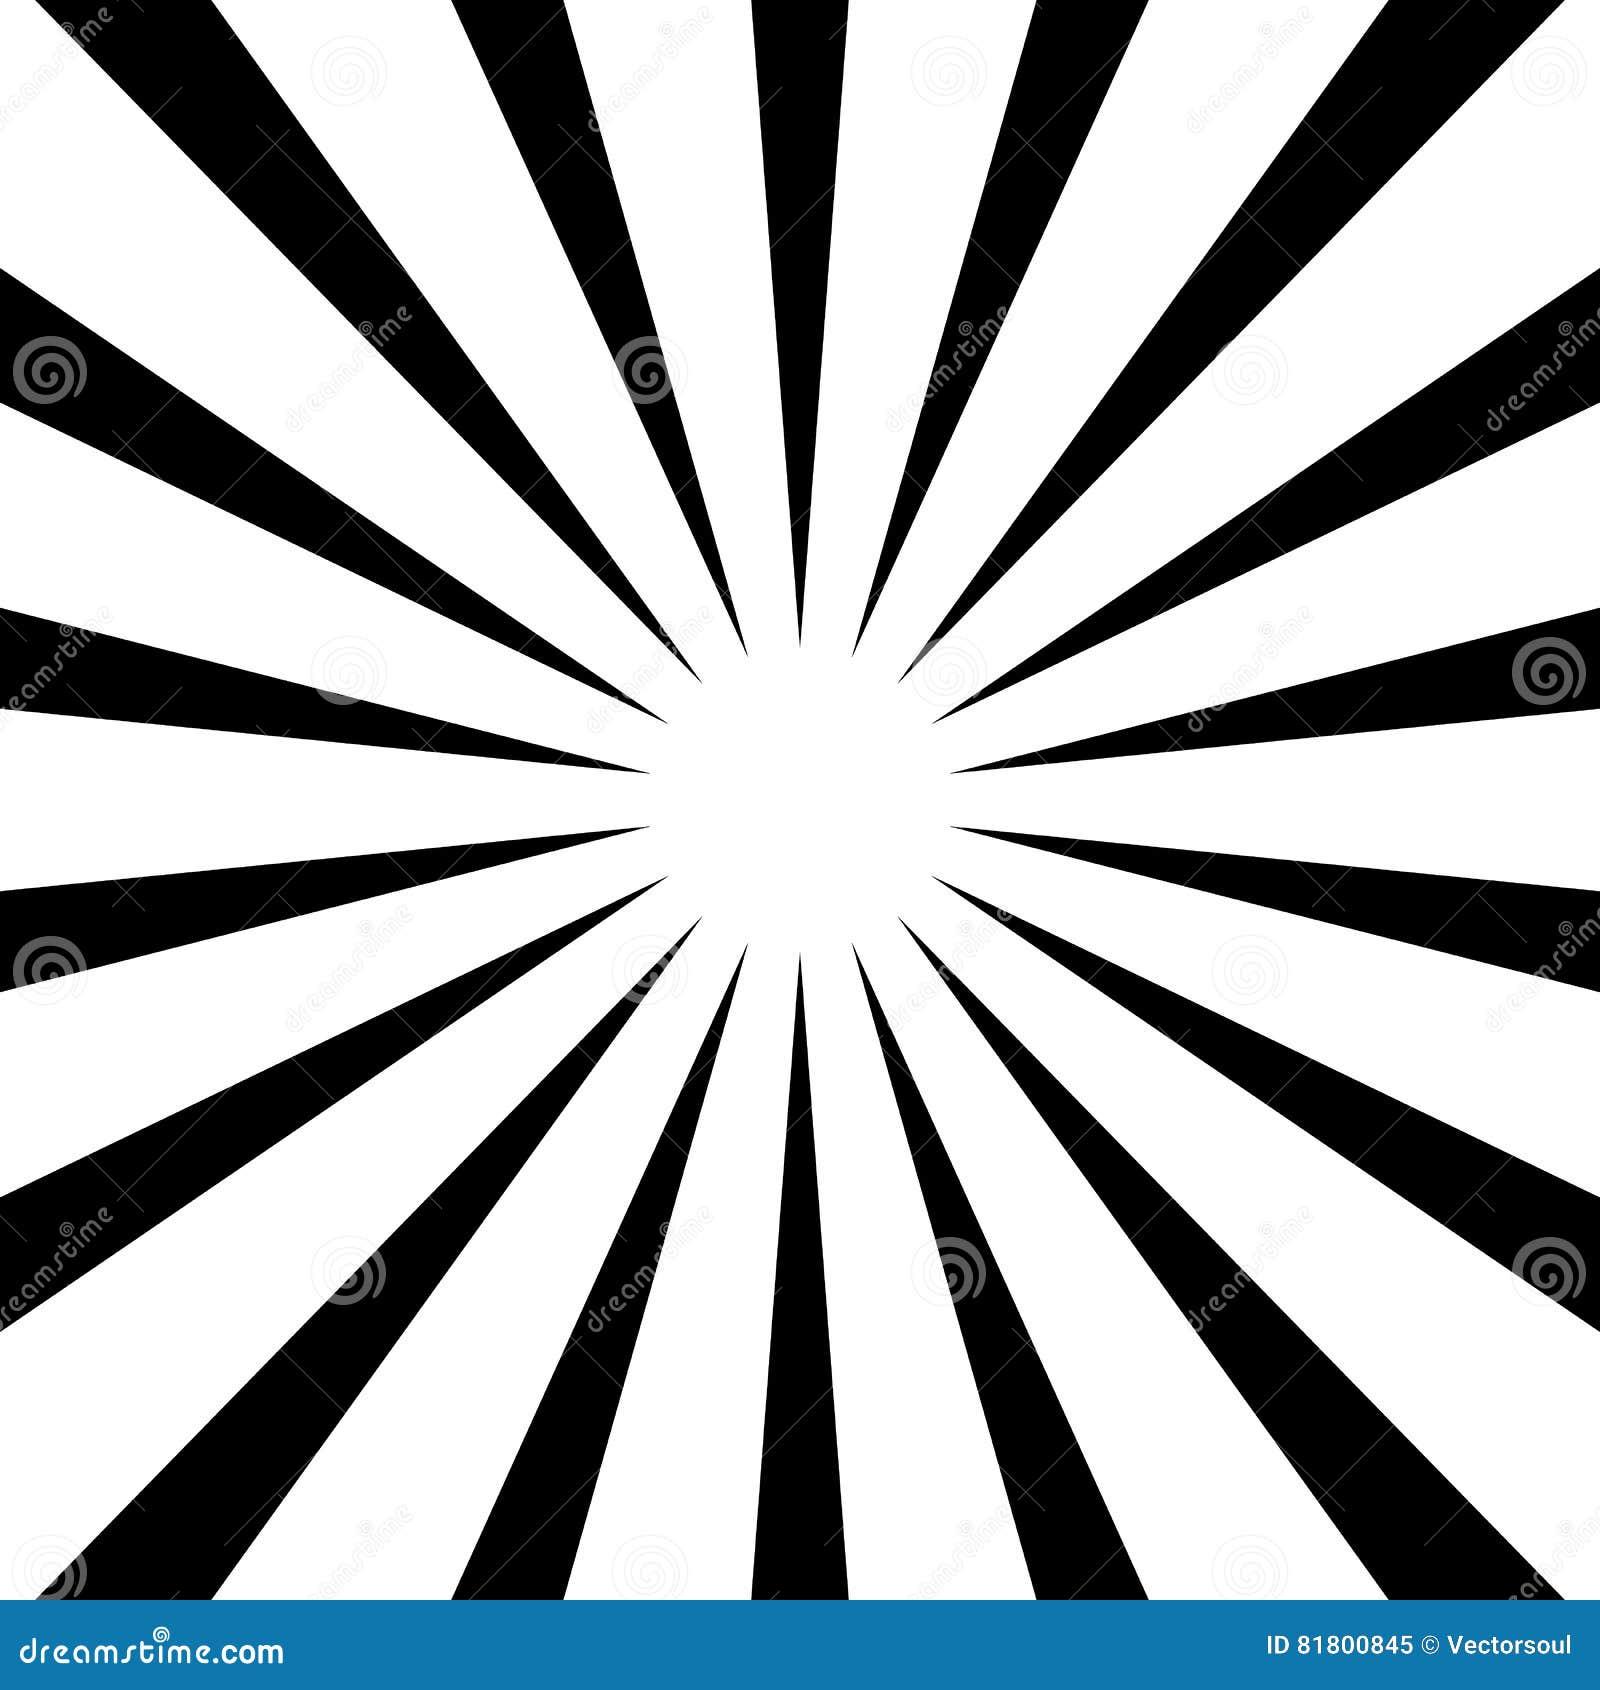 Циркуляр, линии геометрическая картина нашивок Monochrome illustrati